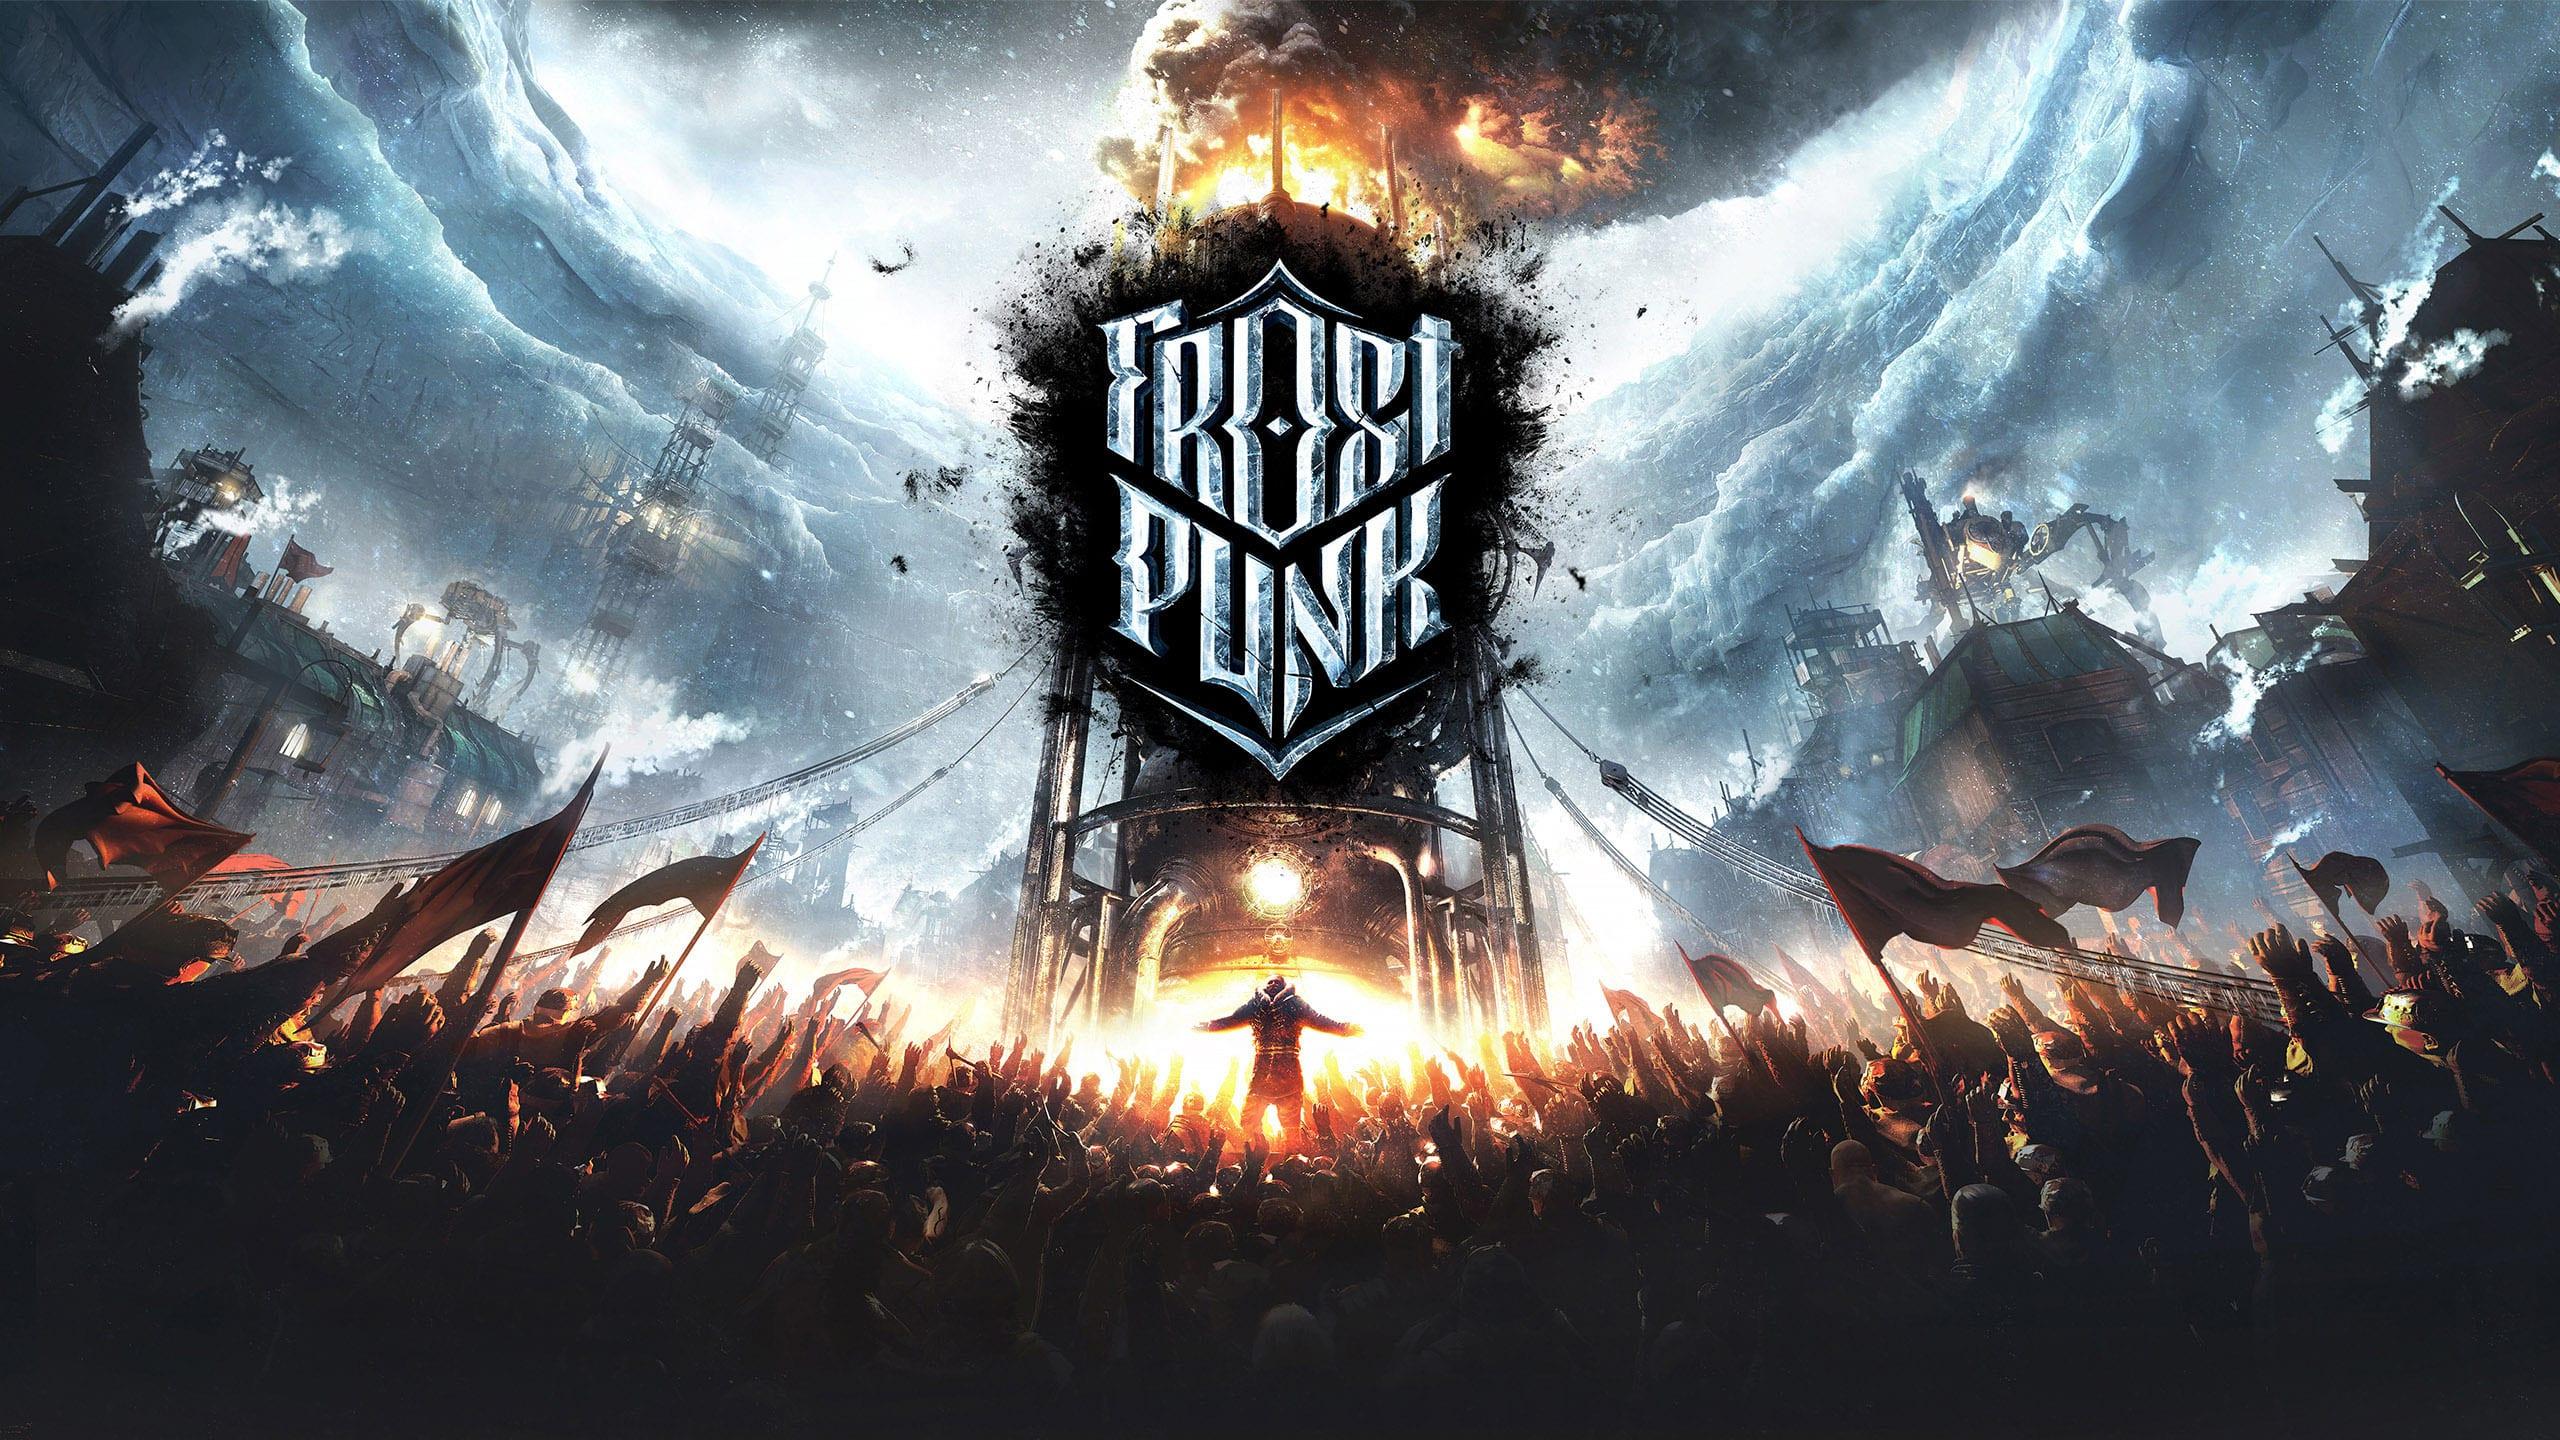 Frostpunk: Διαθέσιμο δωρεάν στο Epic Games Store